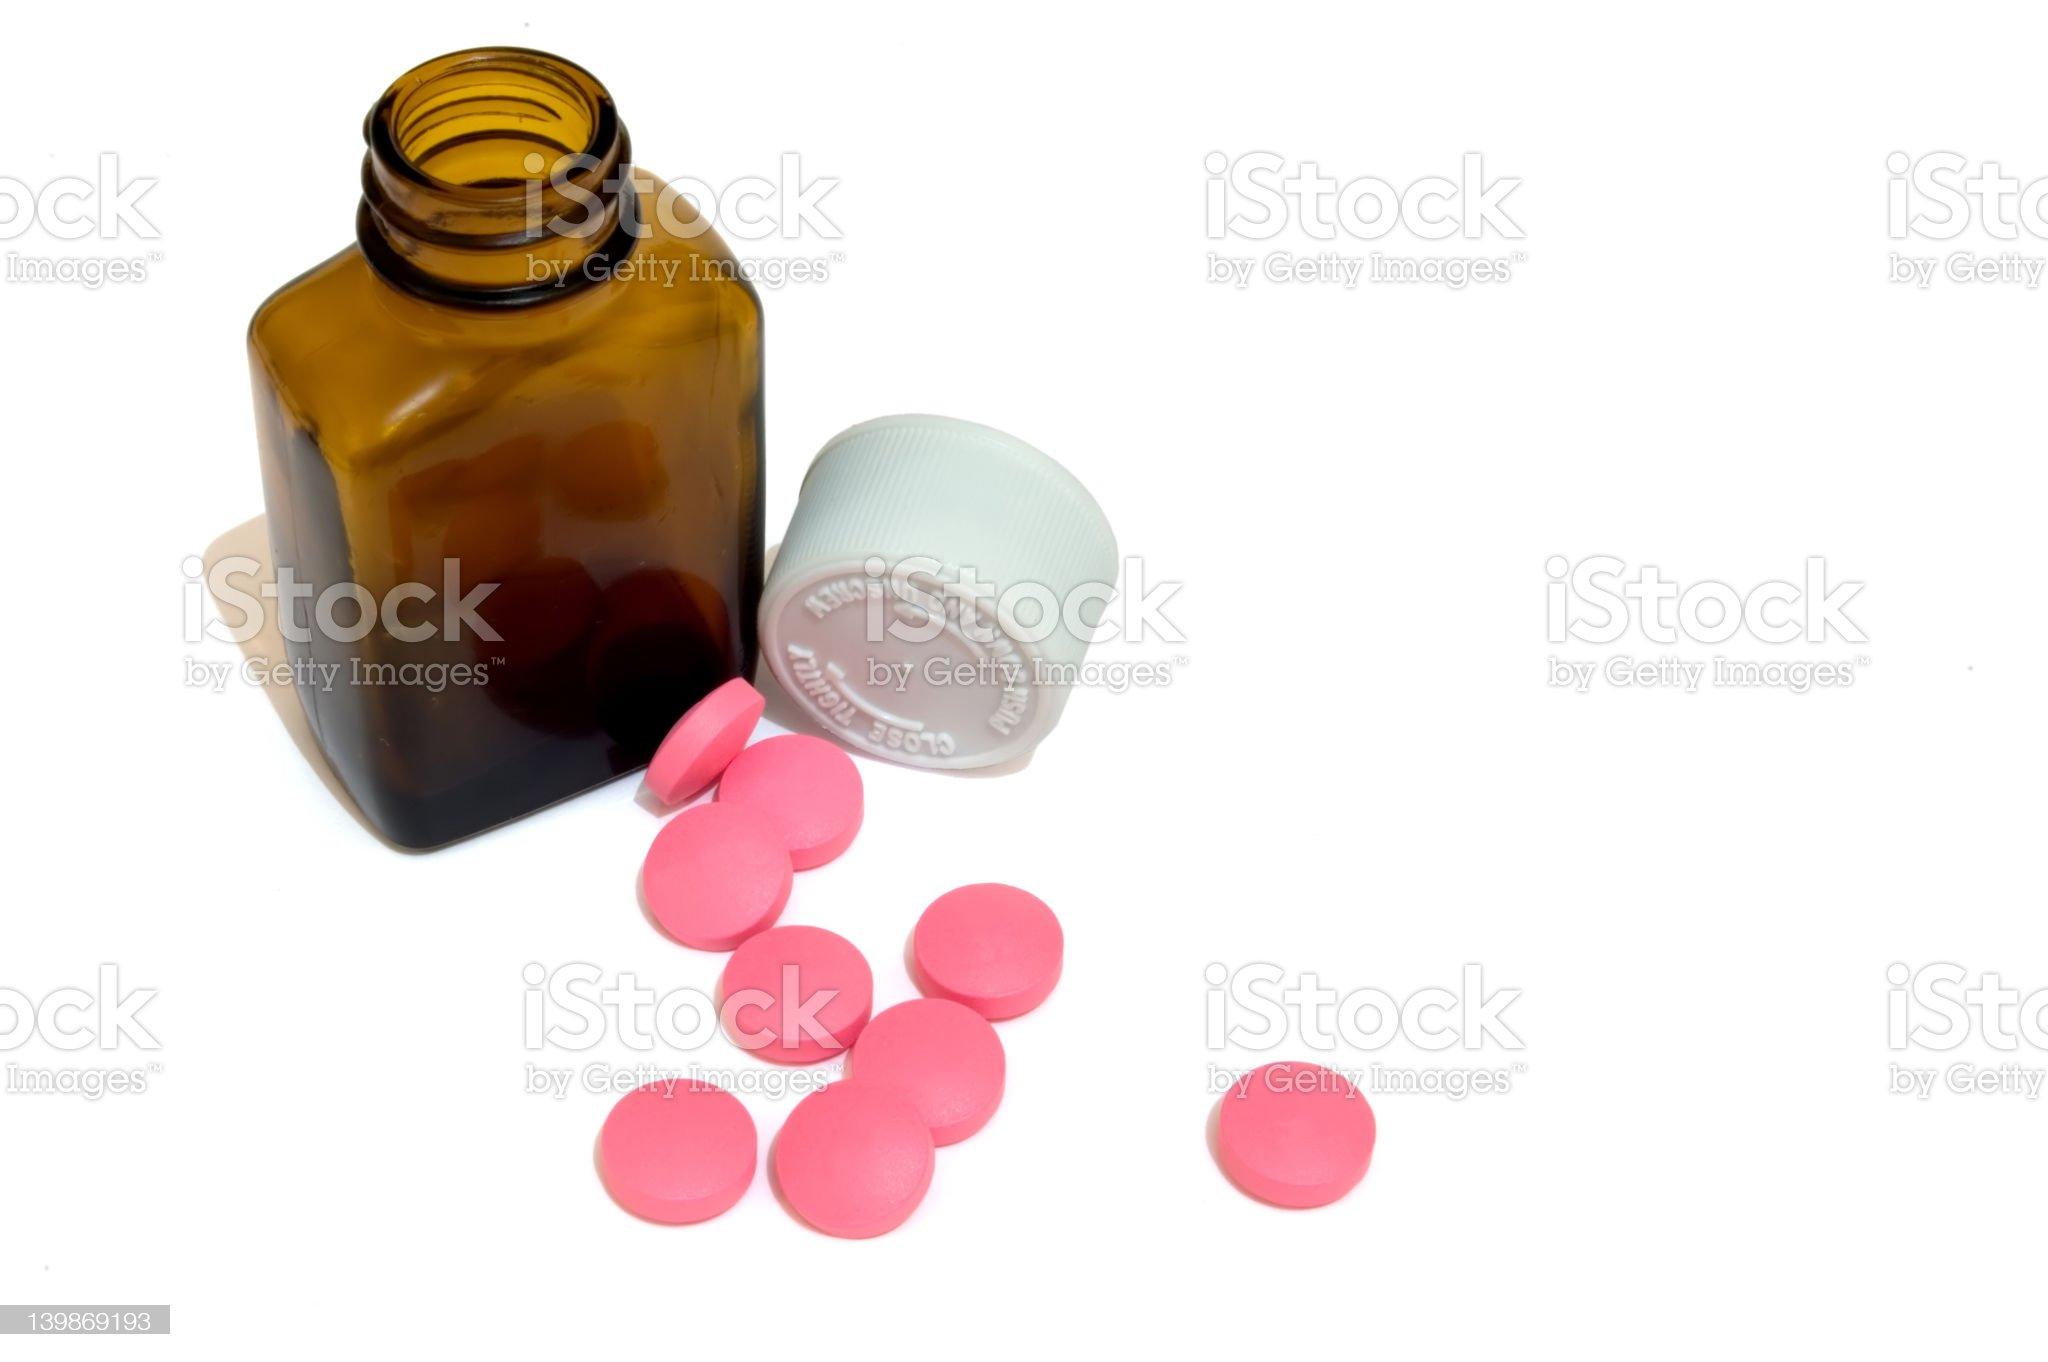 Medical_pills_1 royalty-free stock photo